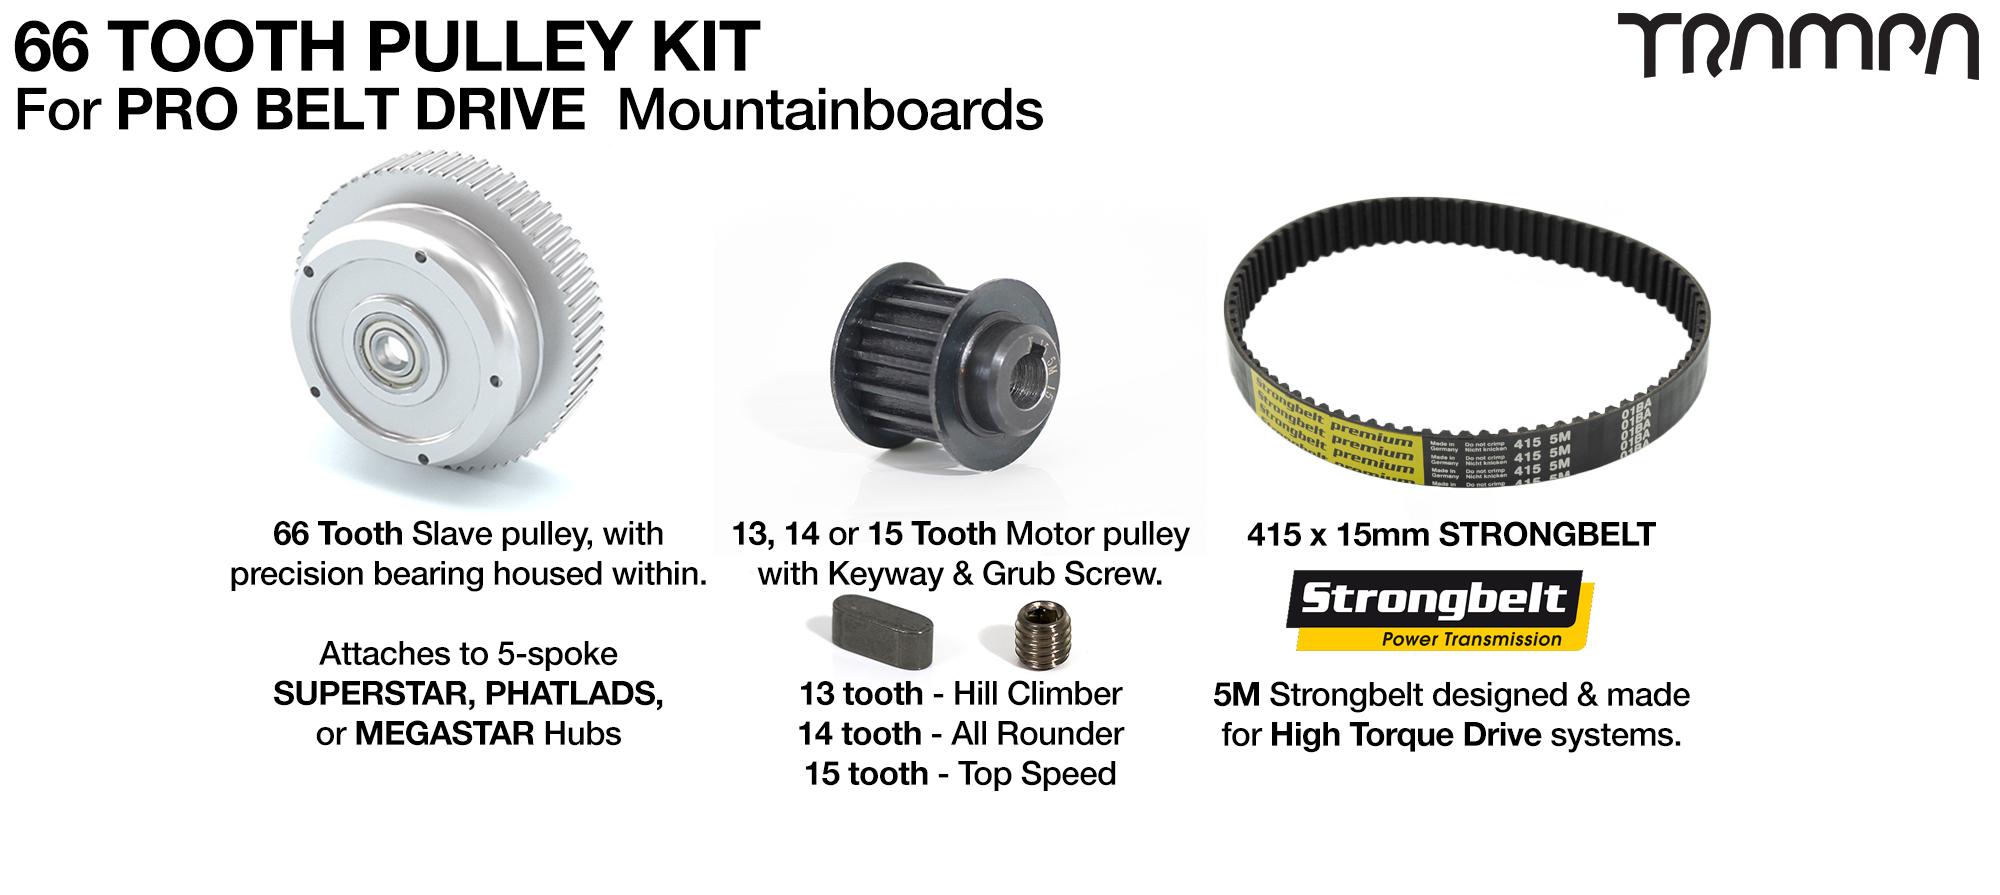 PRO BELT DRIVE MTB Pulley Kit with 66 Tooth Slave & 460mm belt for 8 inch SUPERSTAR or 9 Inch  MEGASTAR wheels